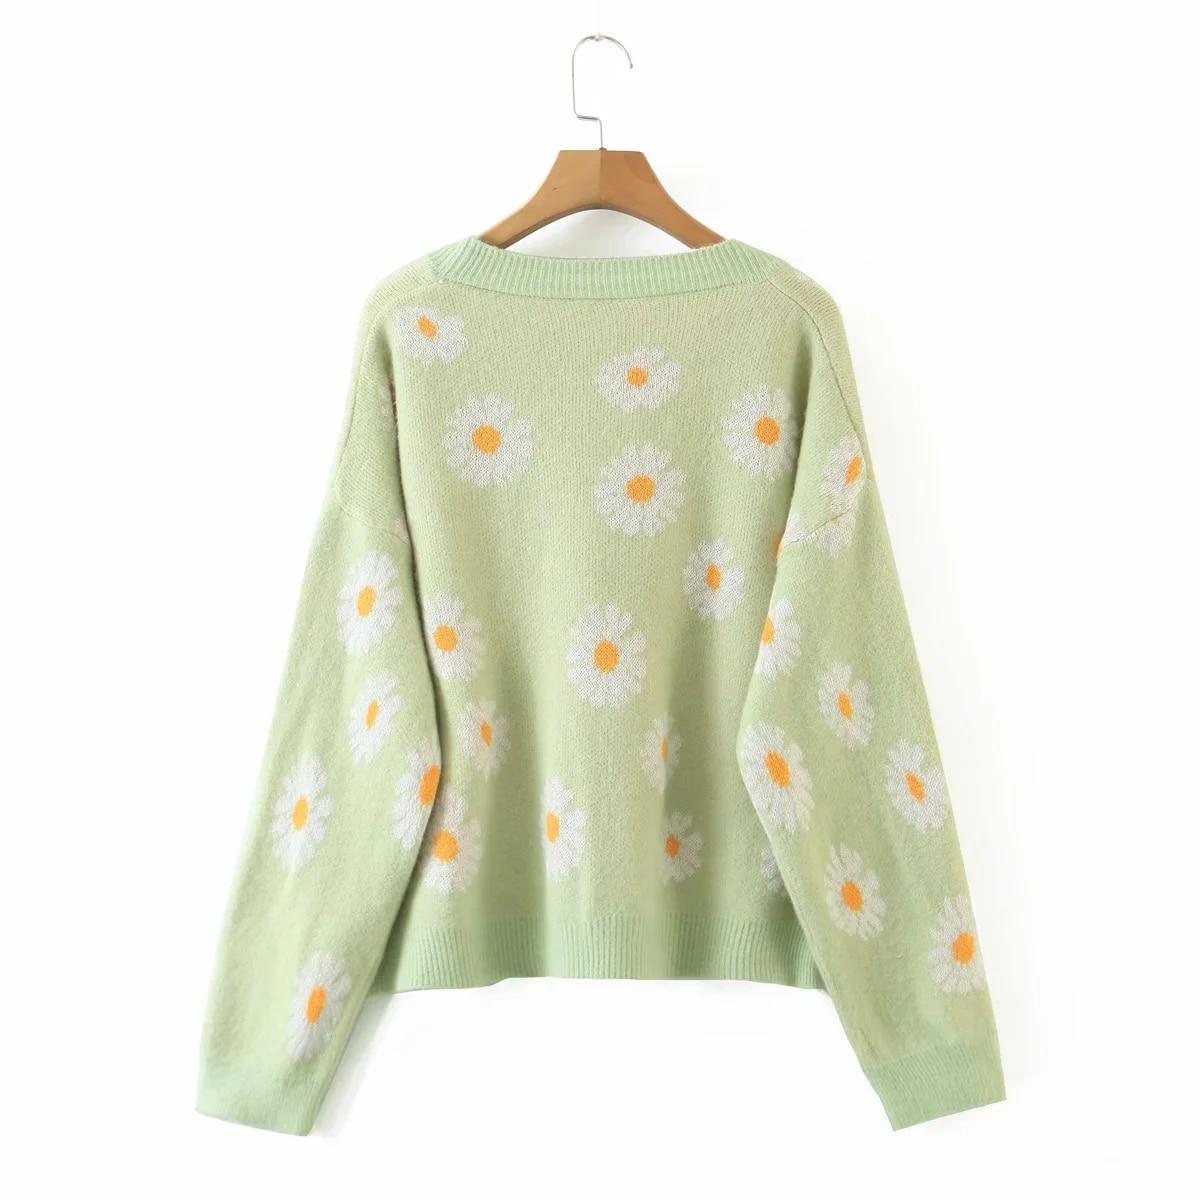 Coat Flower V-Neck Cardigan Sweater